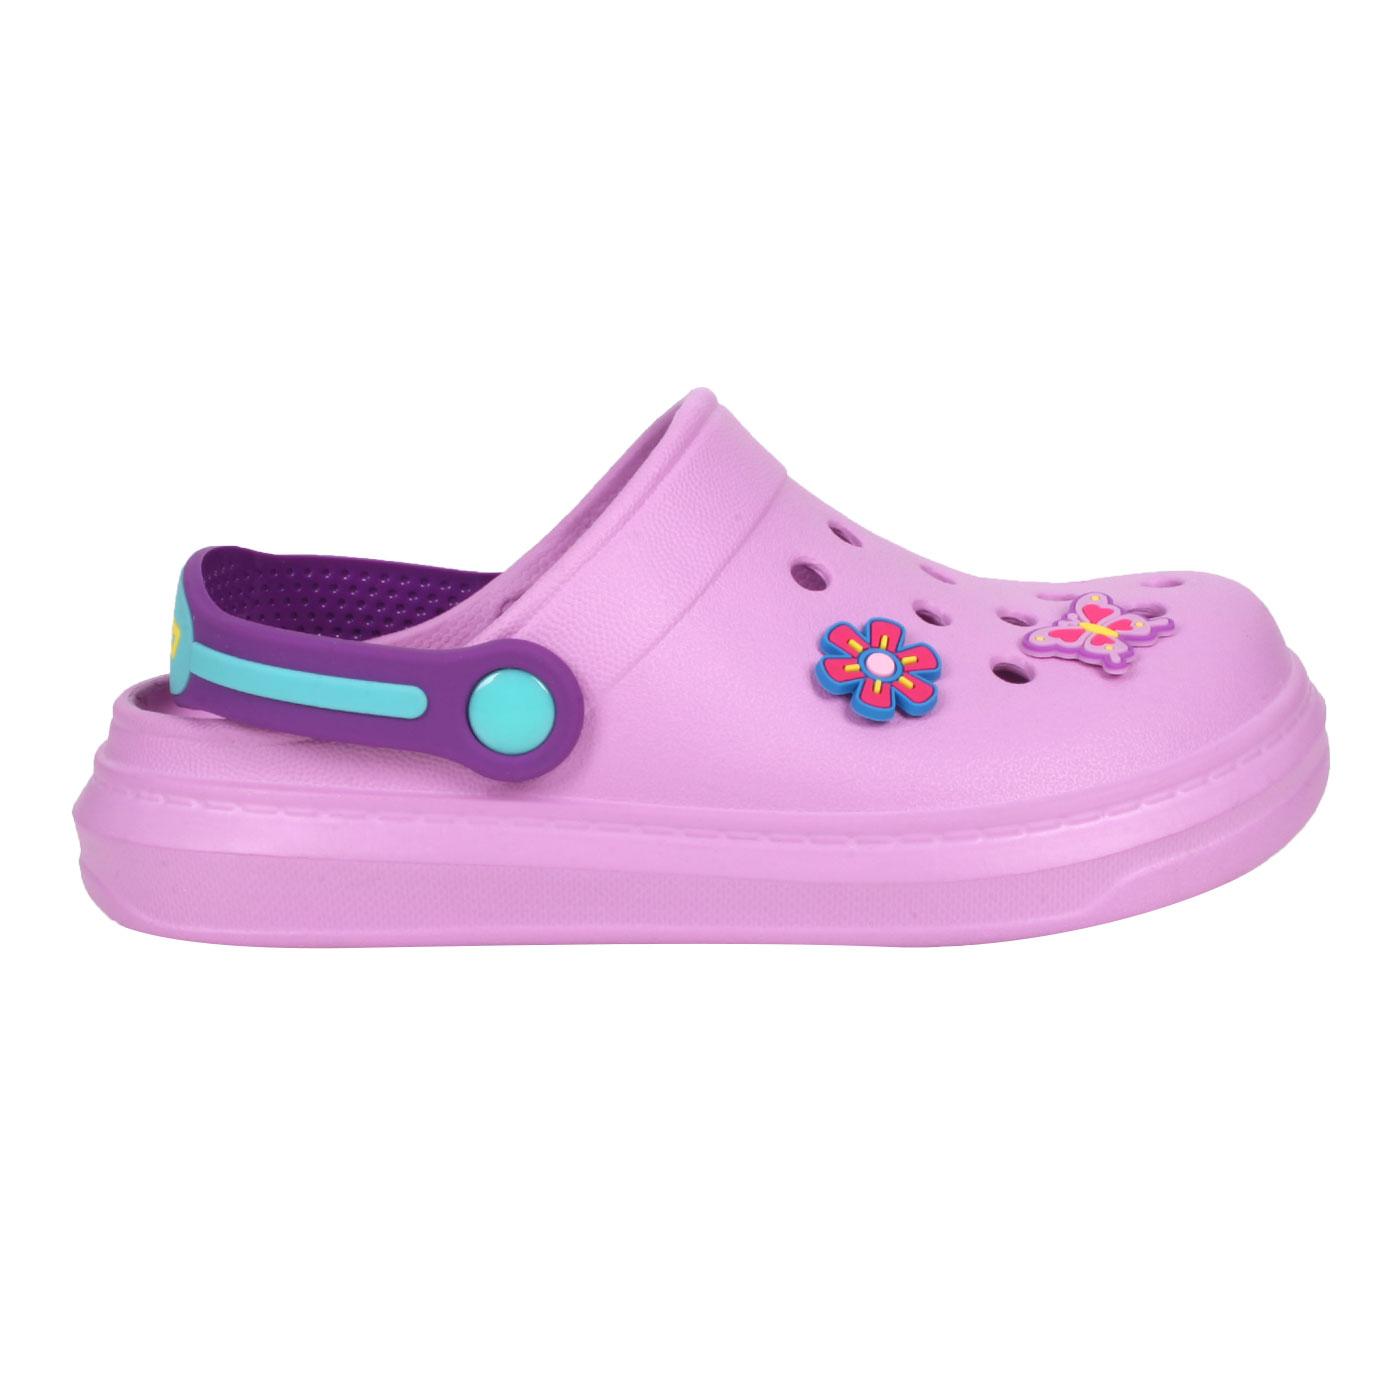 LOTTO 中童FANO清涼拖鞋 LT1AKS3087 - 紫綠黃藍